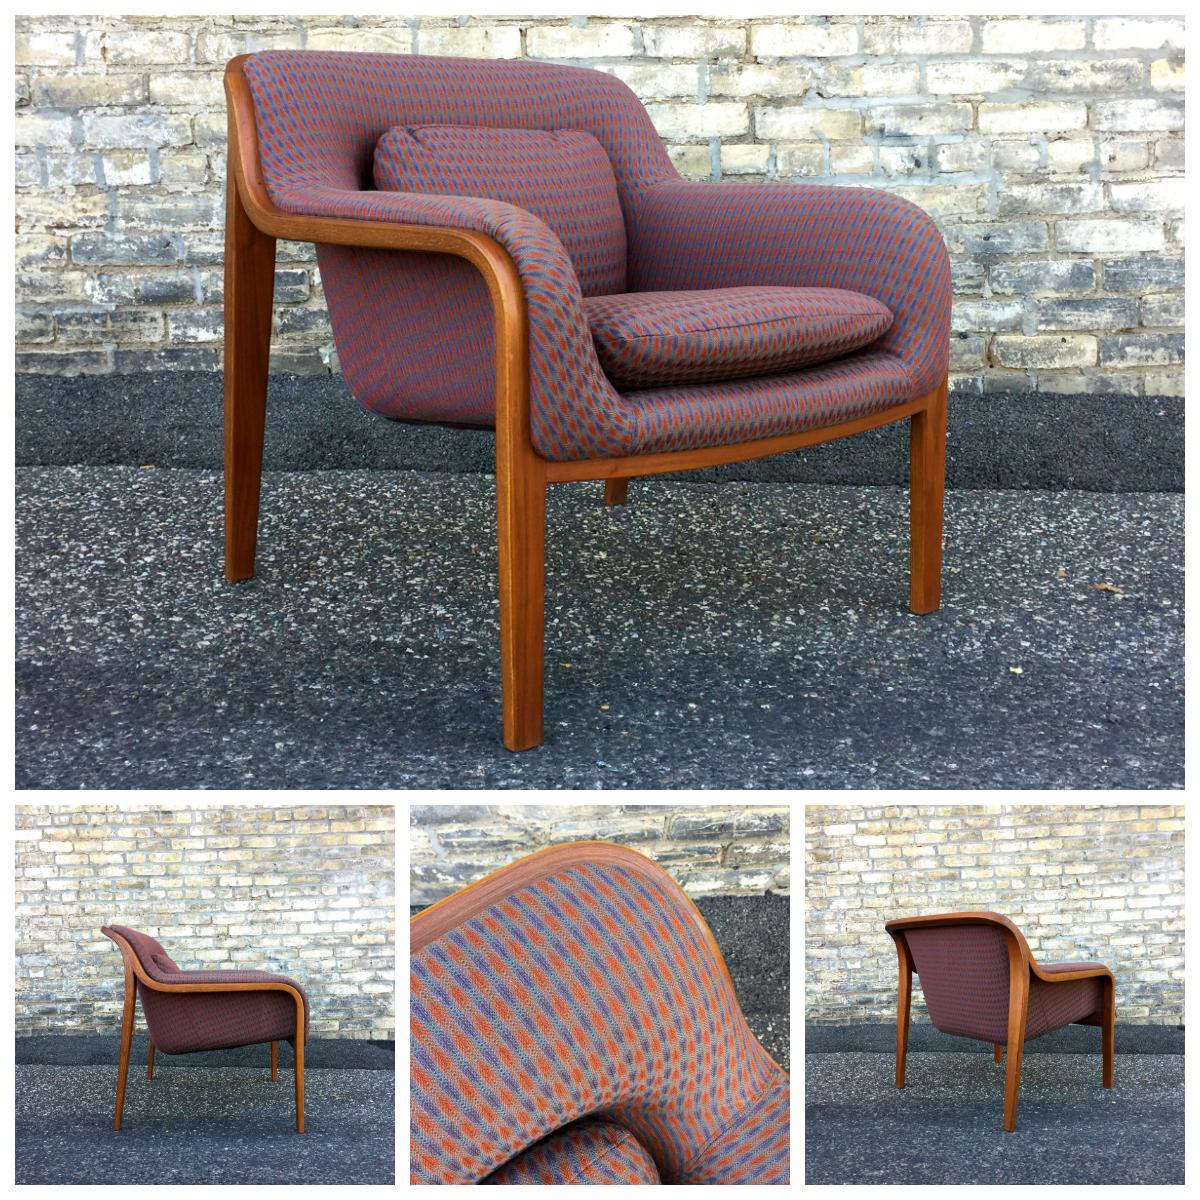 Bill Stephens Model 1315 chair - Knoll